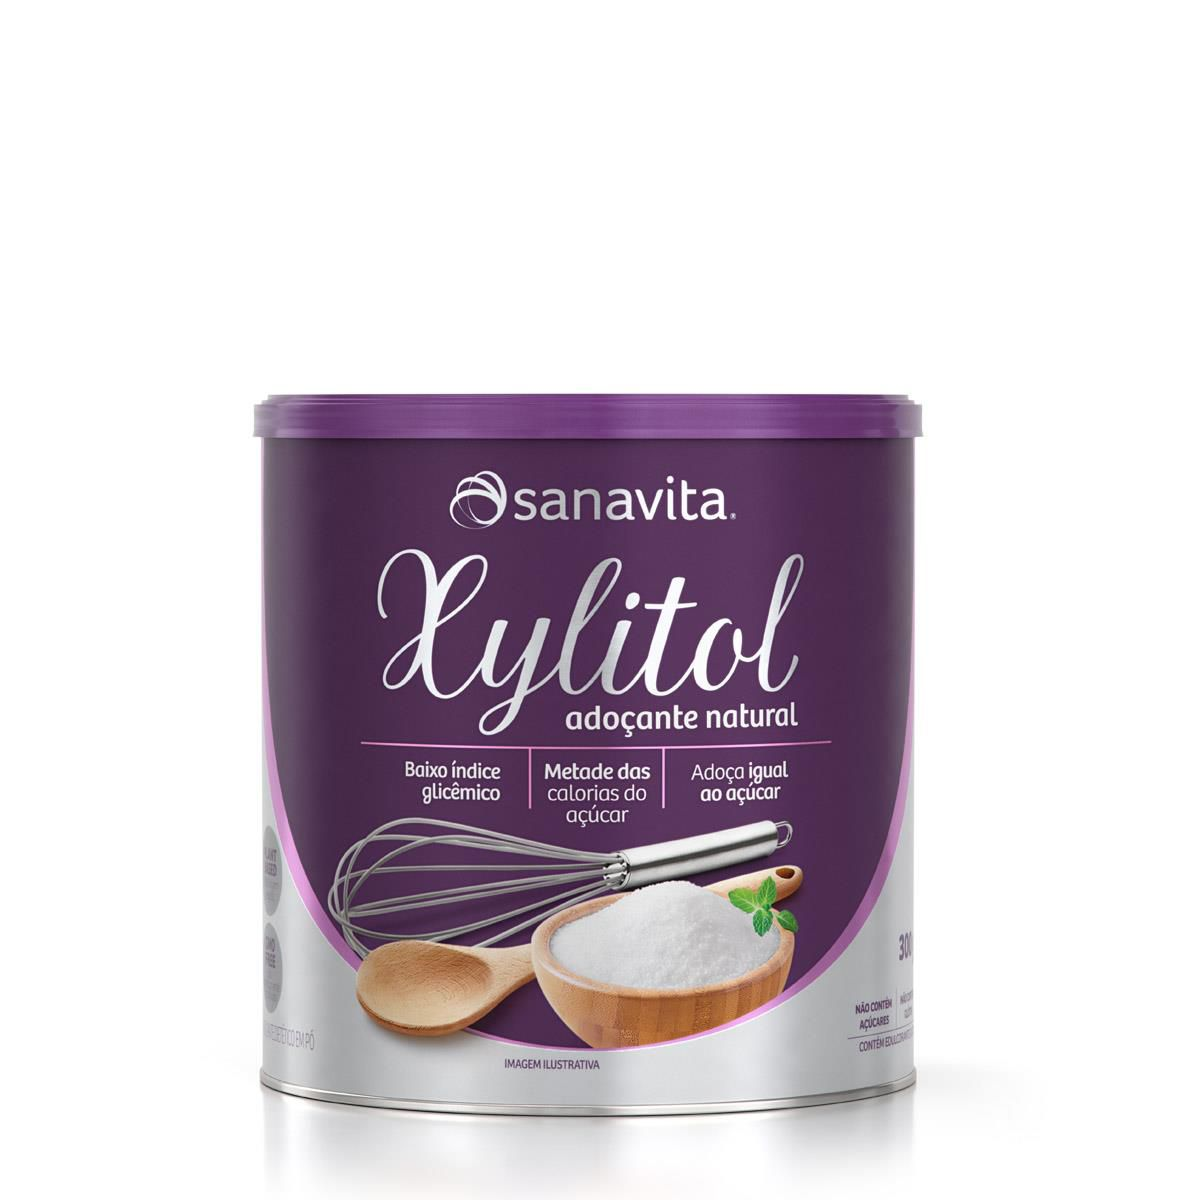 XYLITOL ADOÇANTE NATURAL 300g - Sanavita